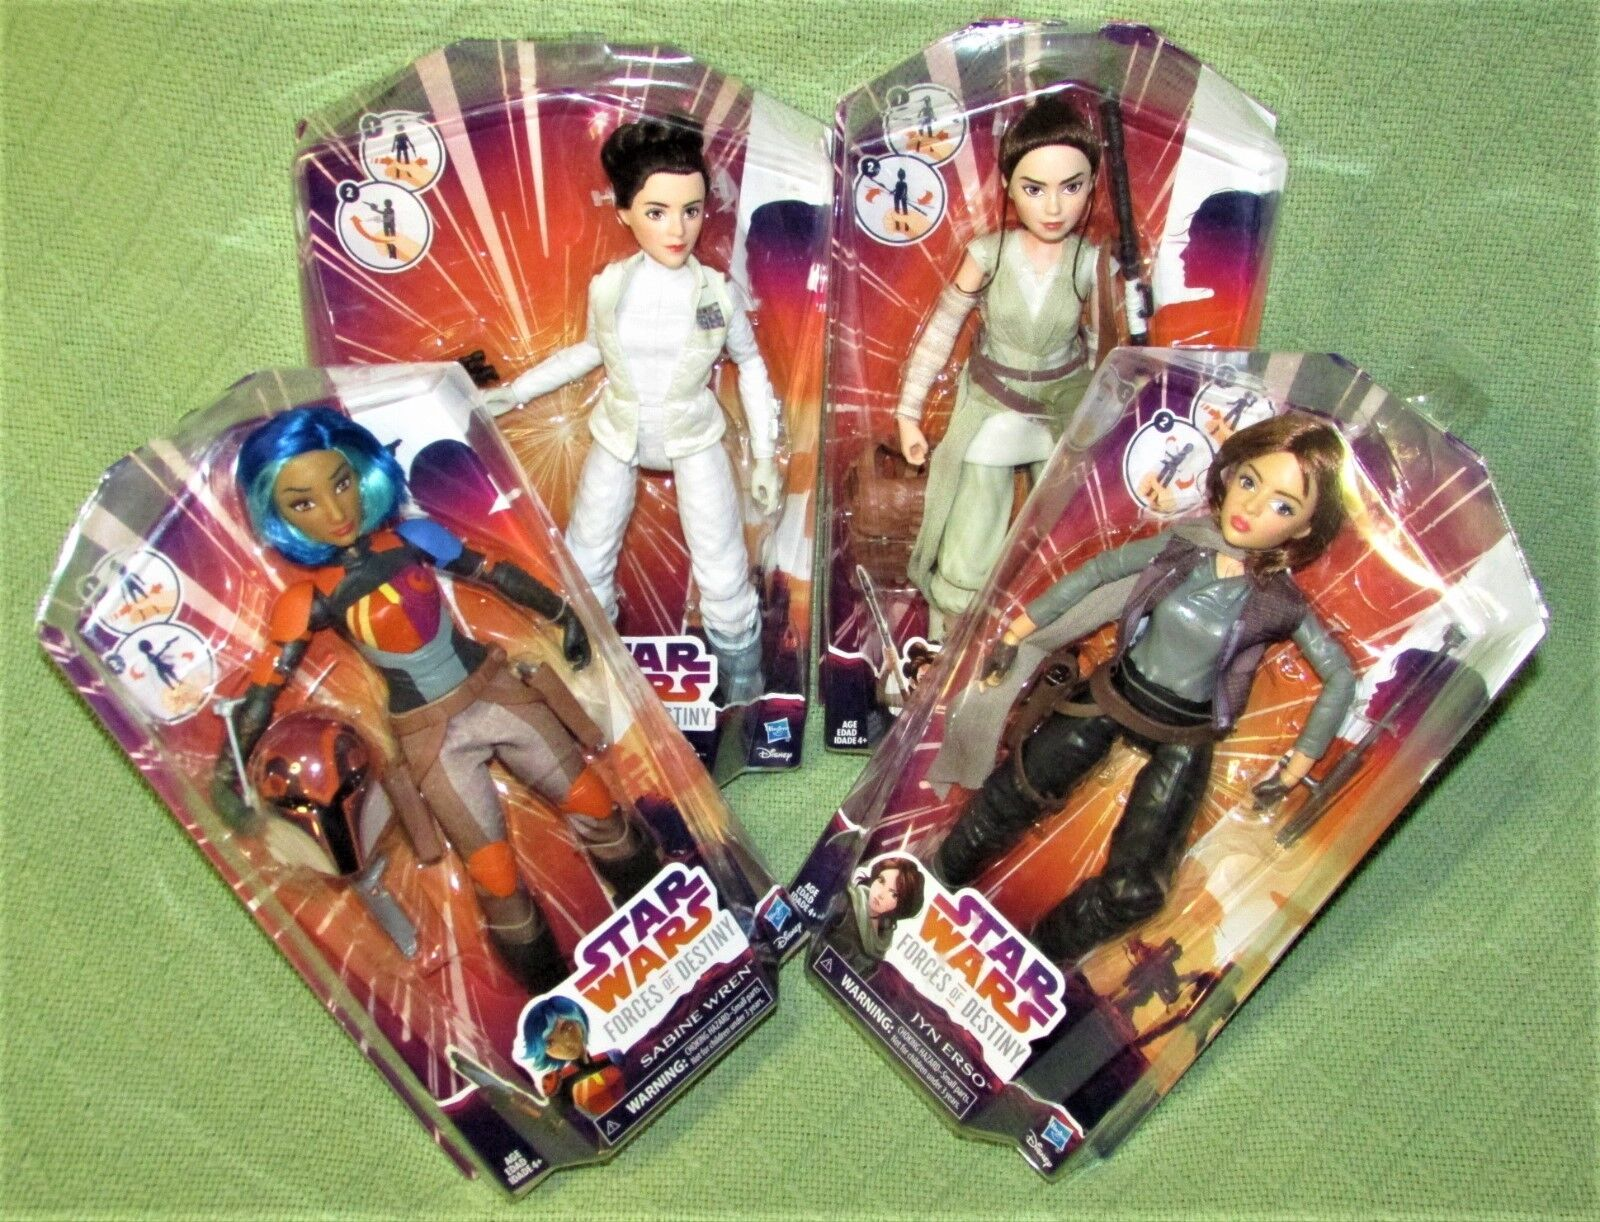 NEW Star Wars FORCES of DESTINY Doll Lot REY Jyn SABINE Princess LEIA R2D2 NIB